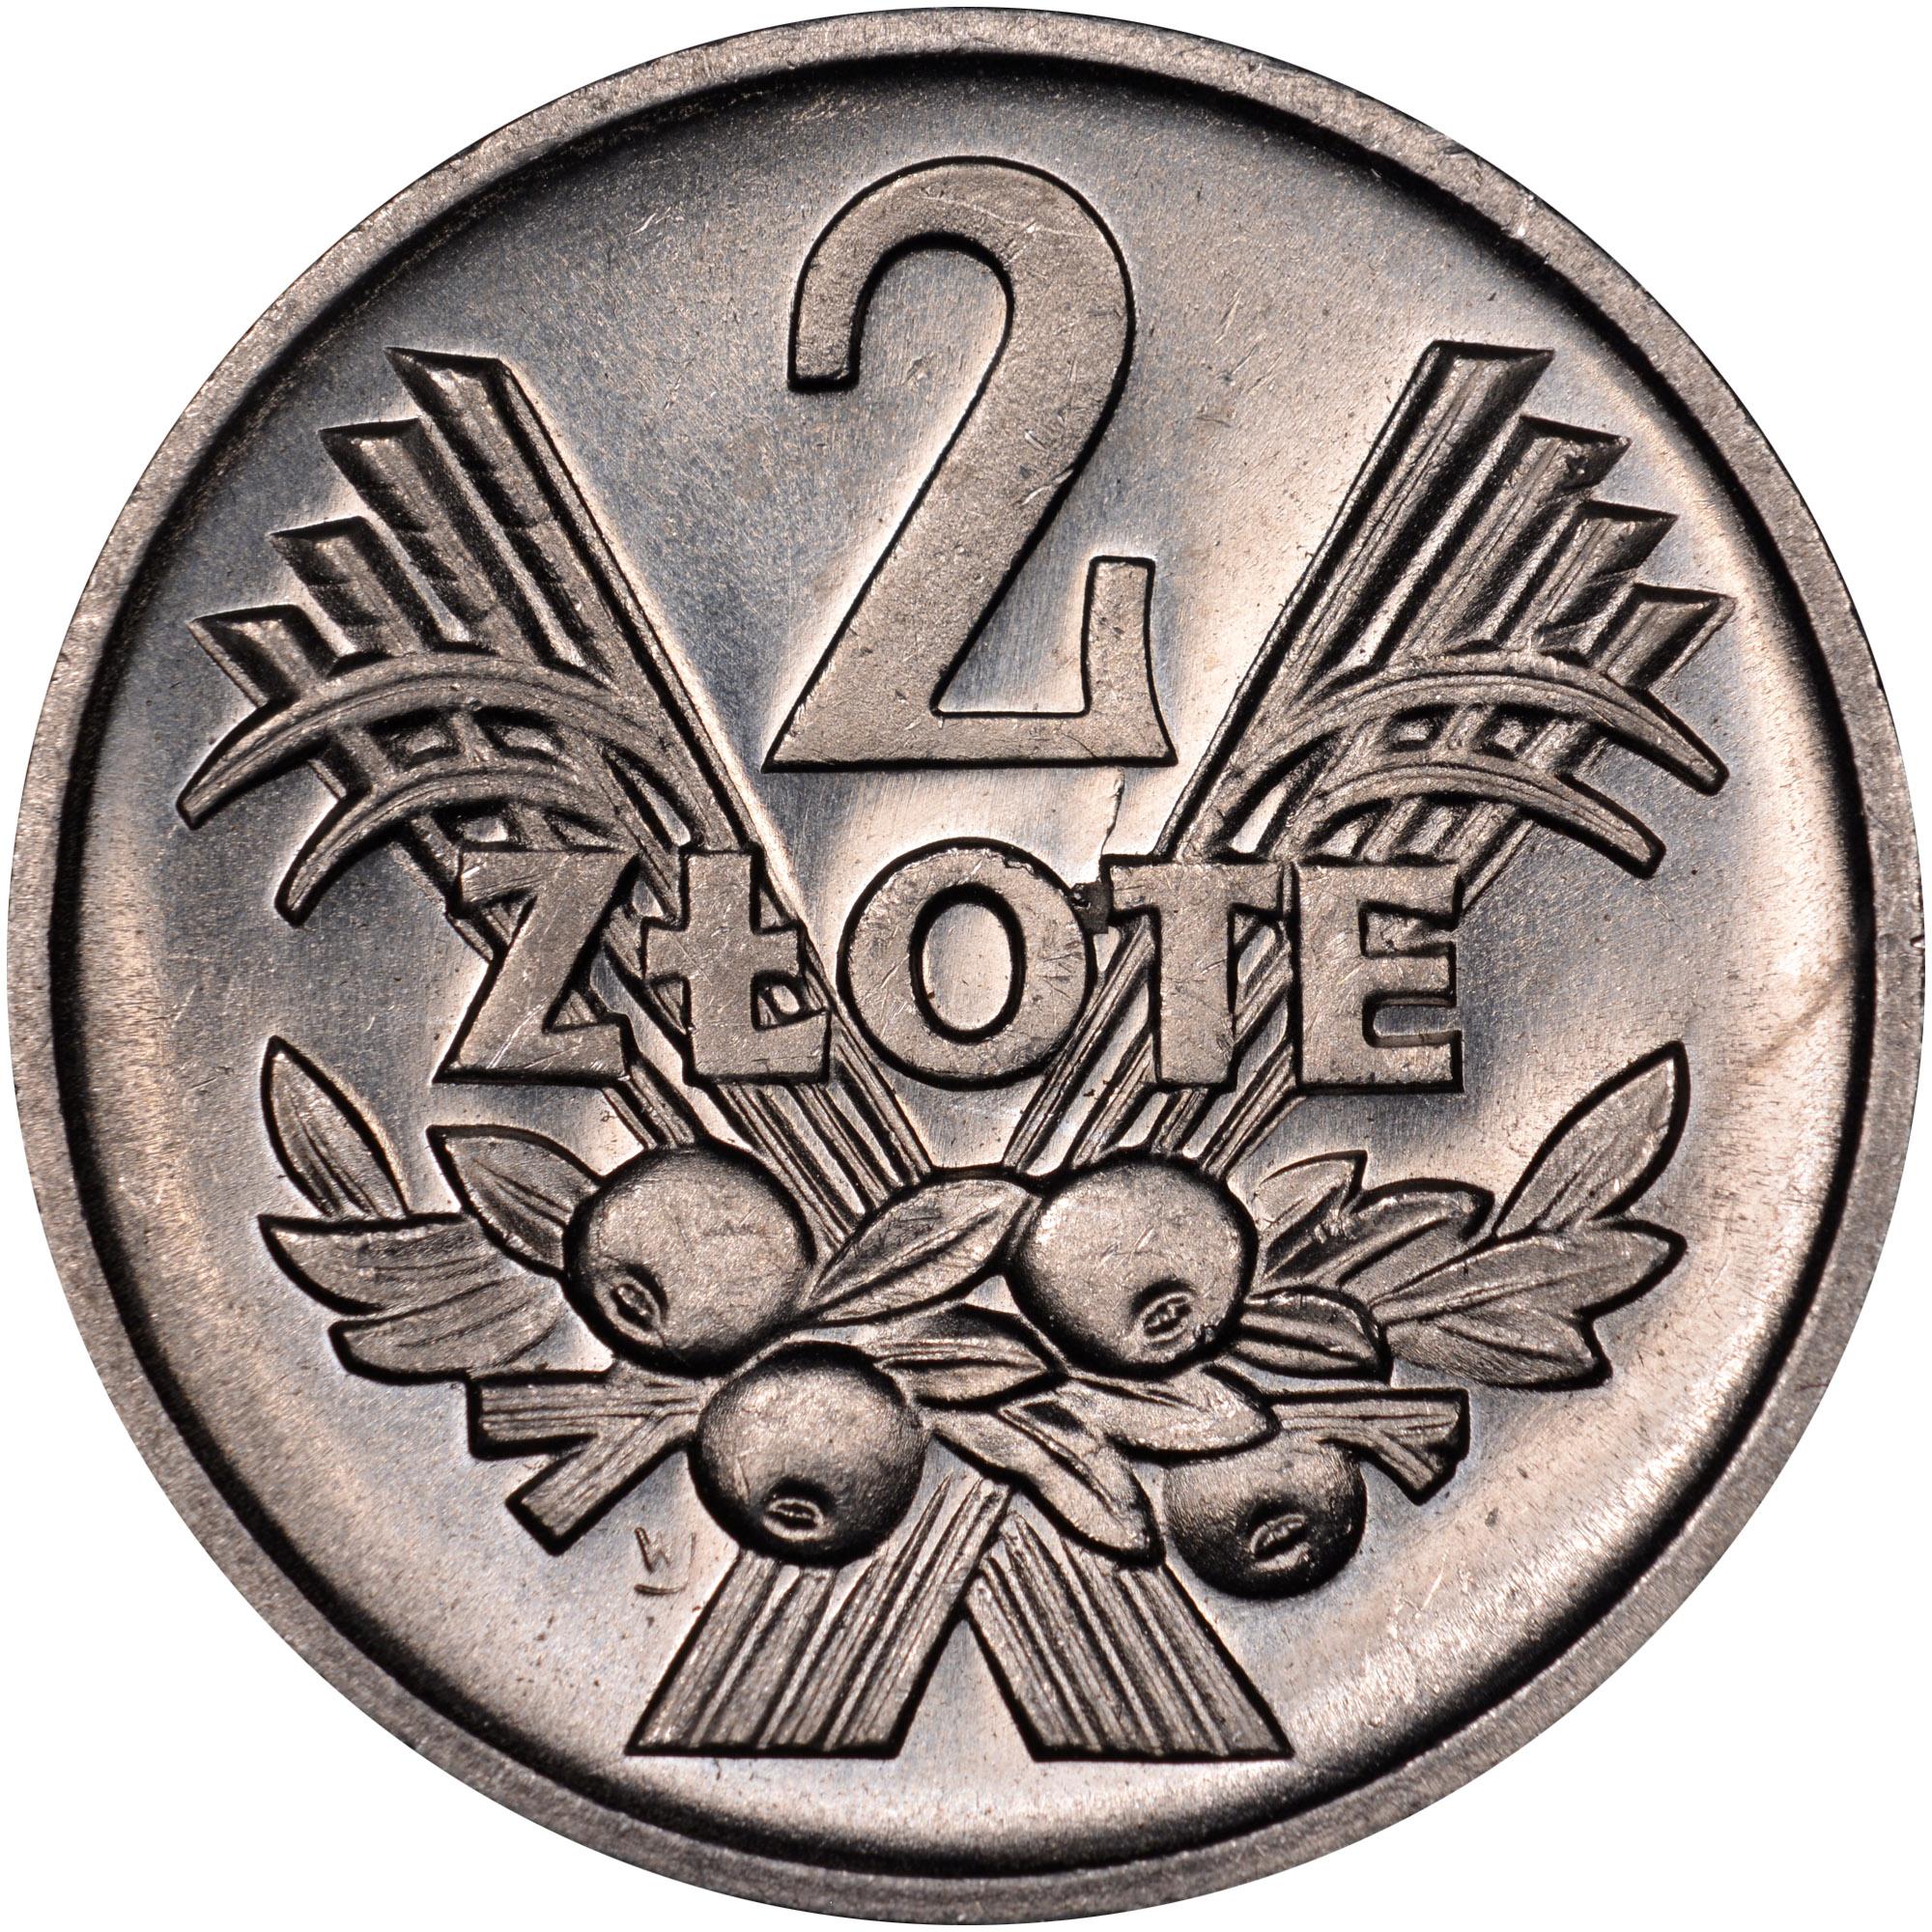 1974 Aluminum Penny Test